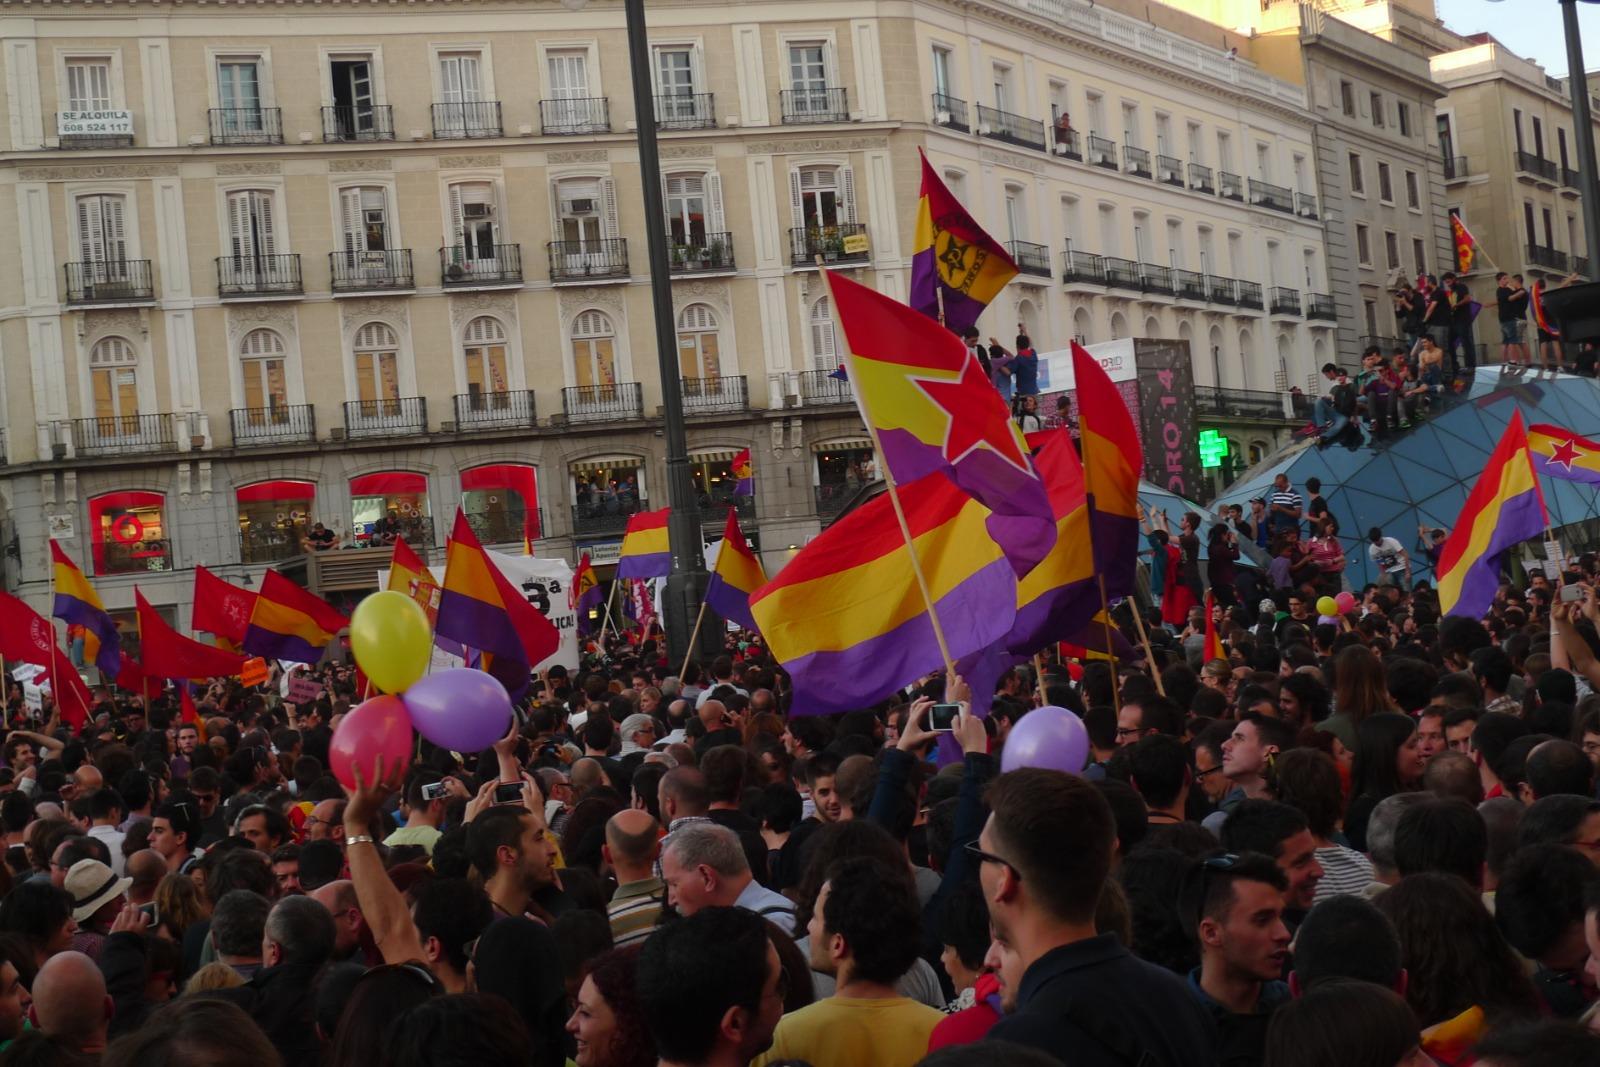 Tweespalt in Spanje tussen republikeinen en koningsgezinden